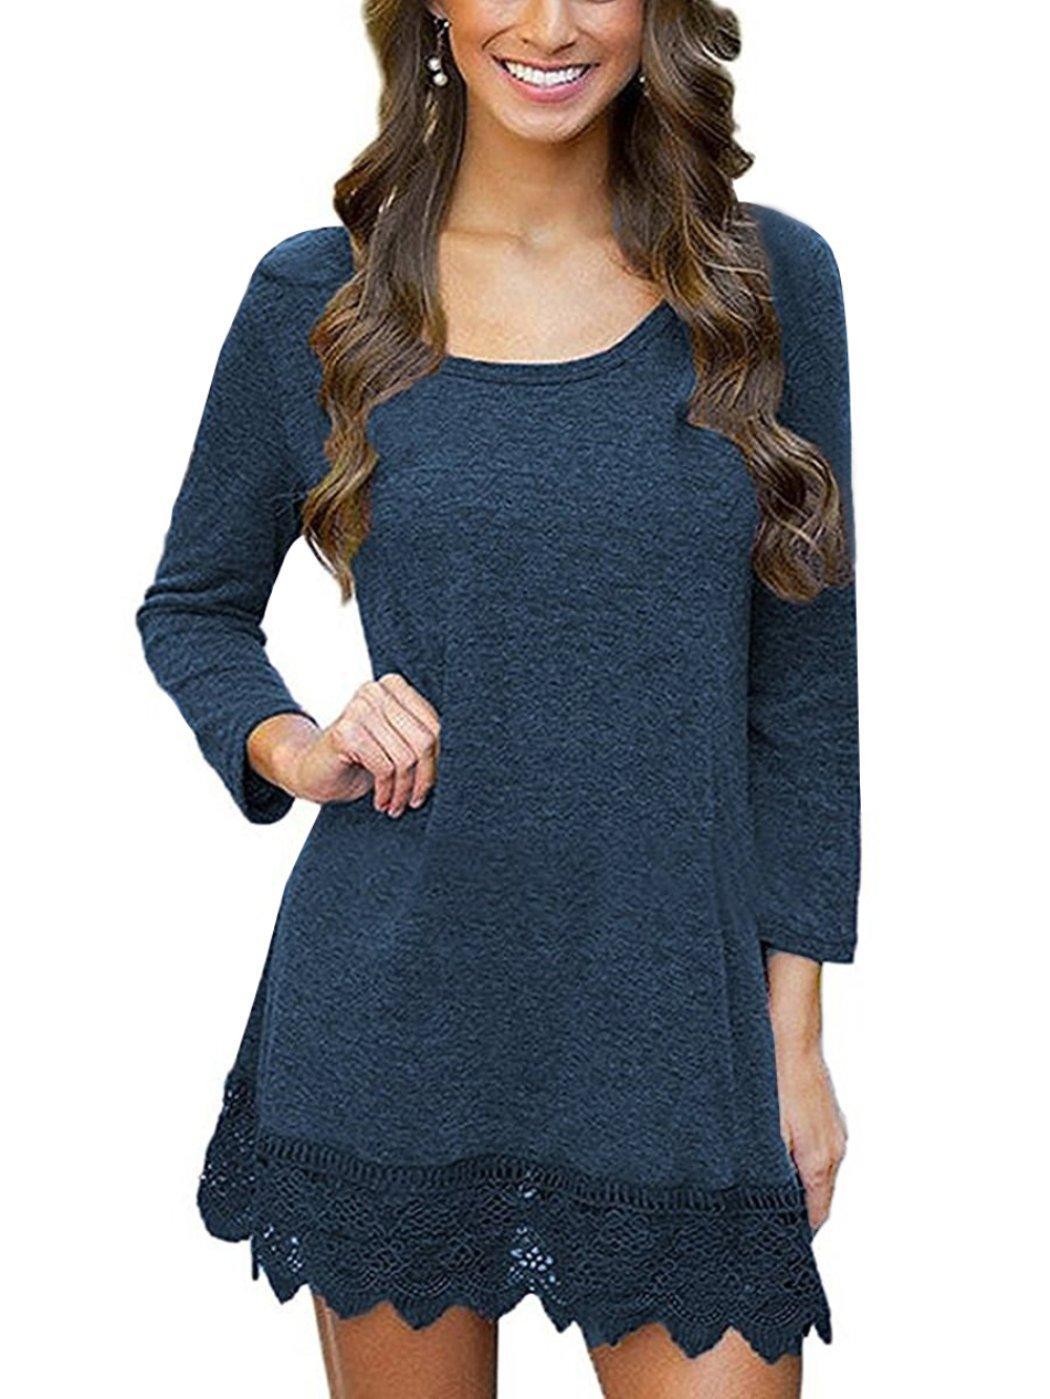 MiYang Women's Long Sleeve A-line Lace Stitching Trim Casual Dress XS Blue